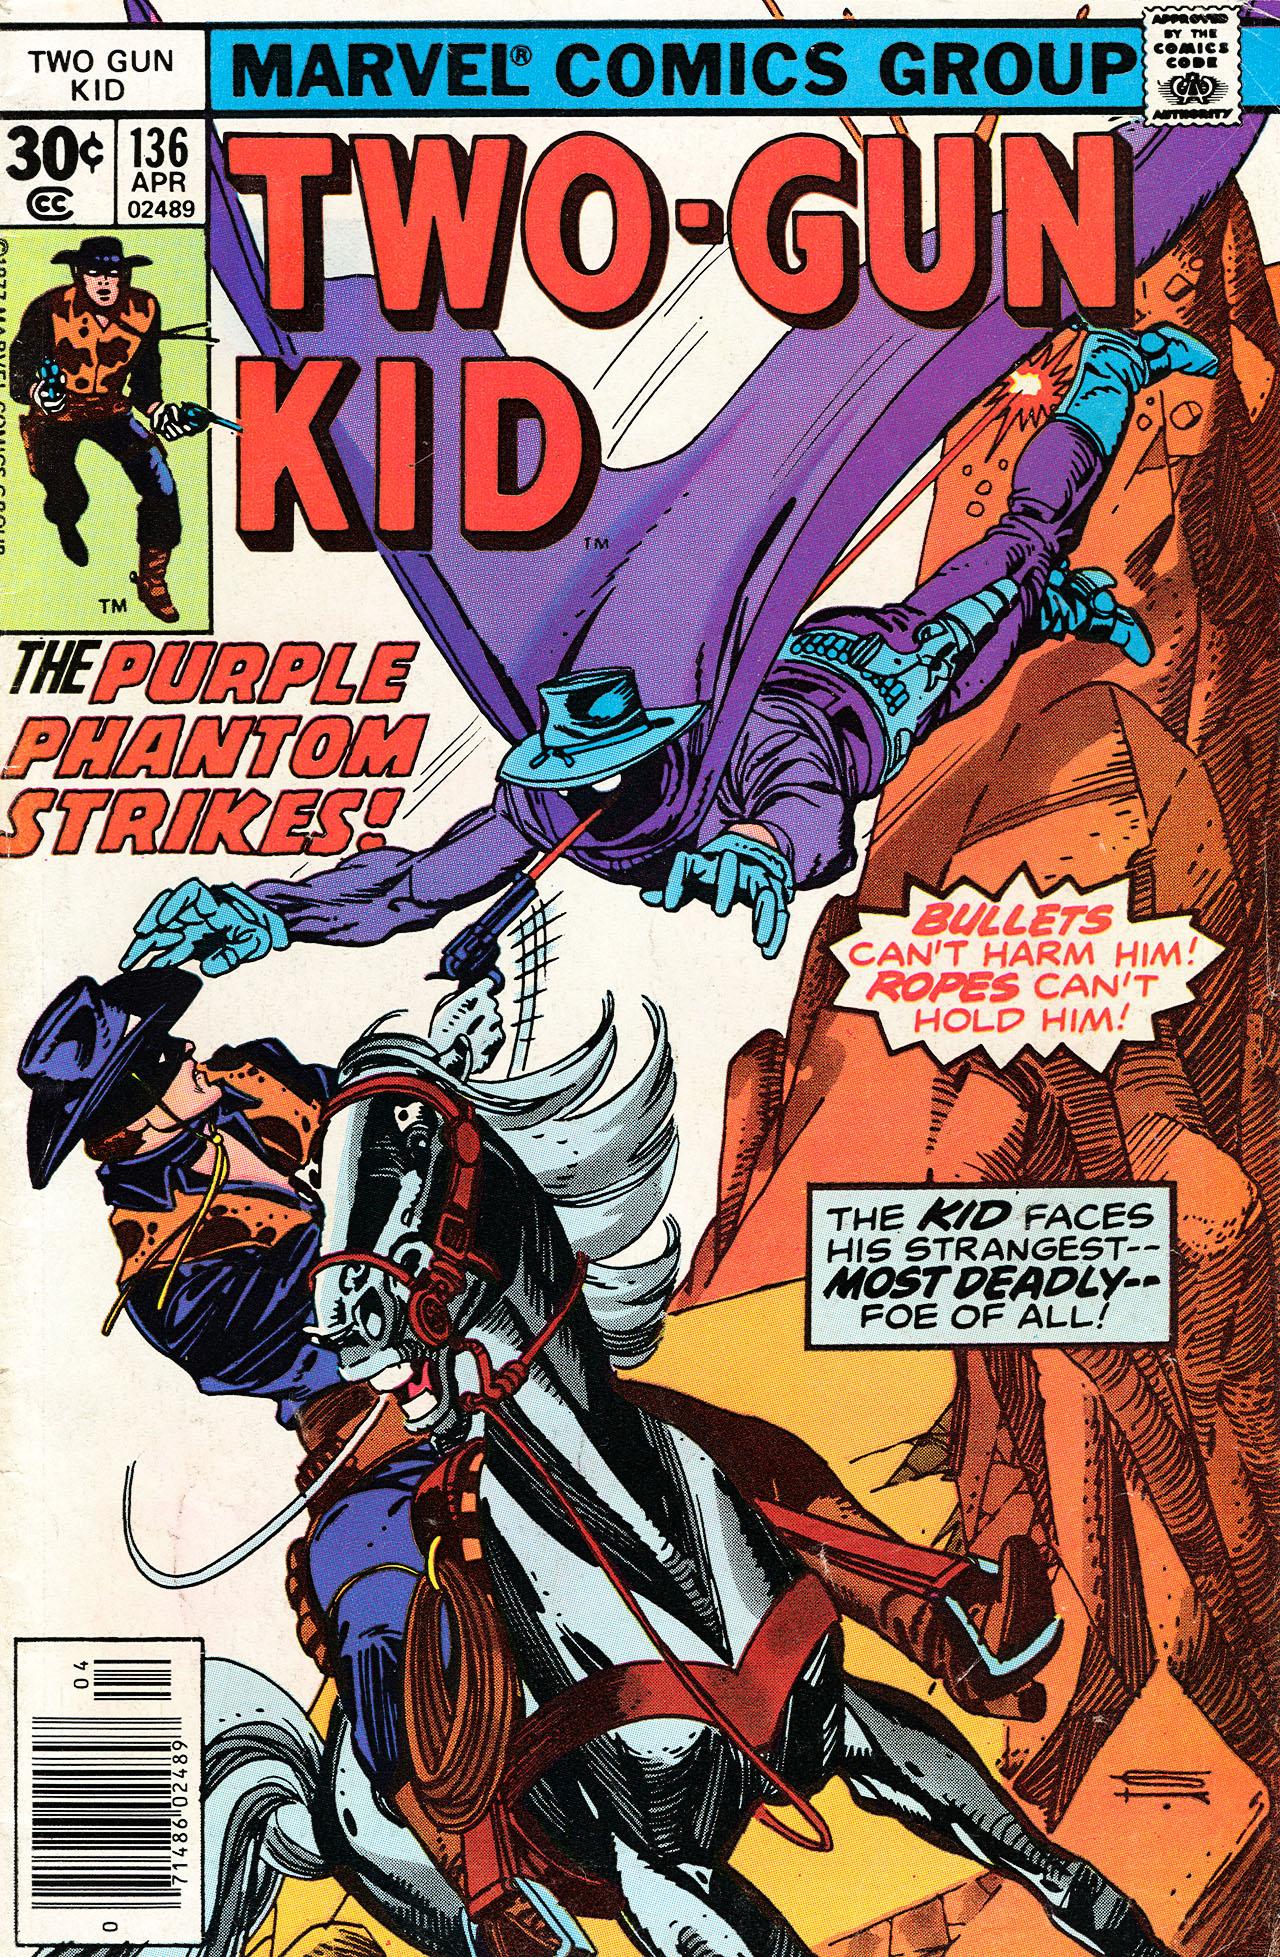 Read online Two-Gun Kid comic -  Issue #136 - 1